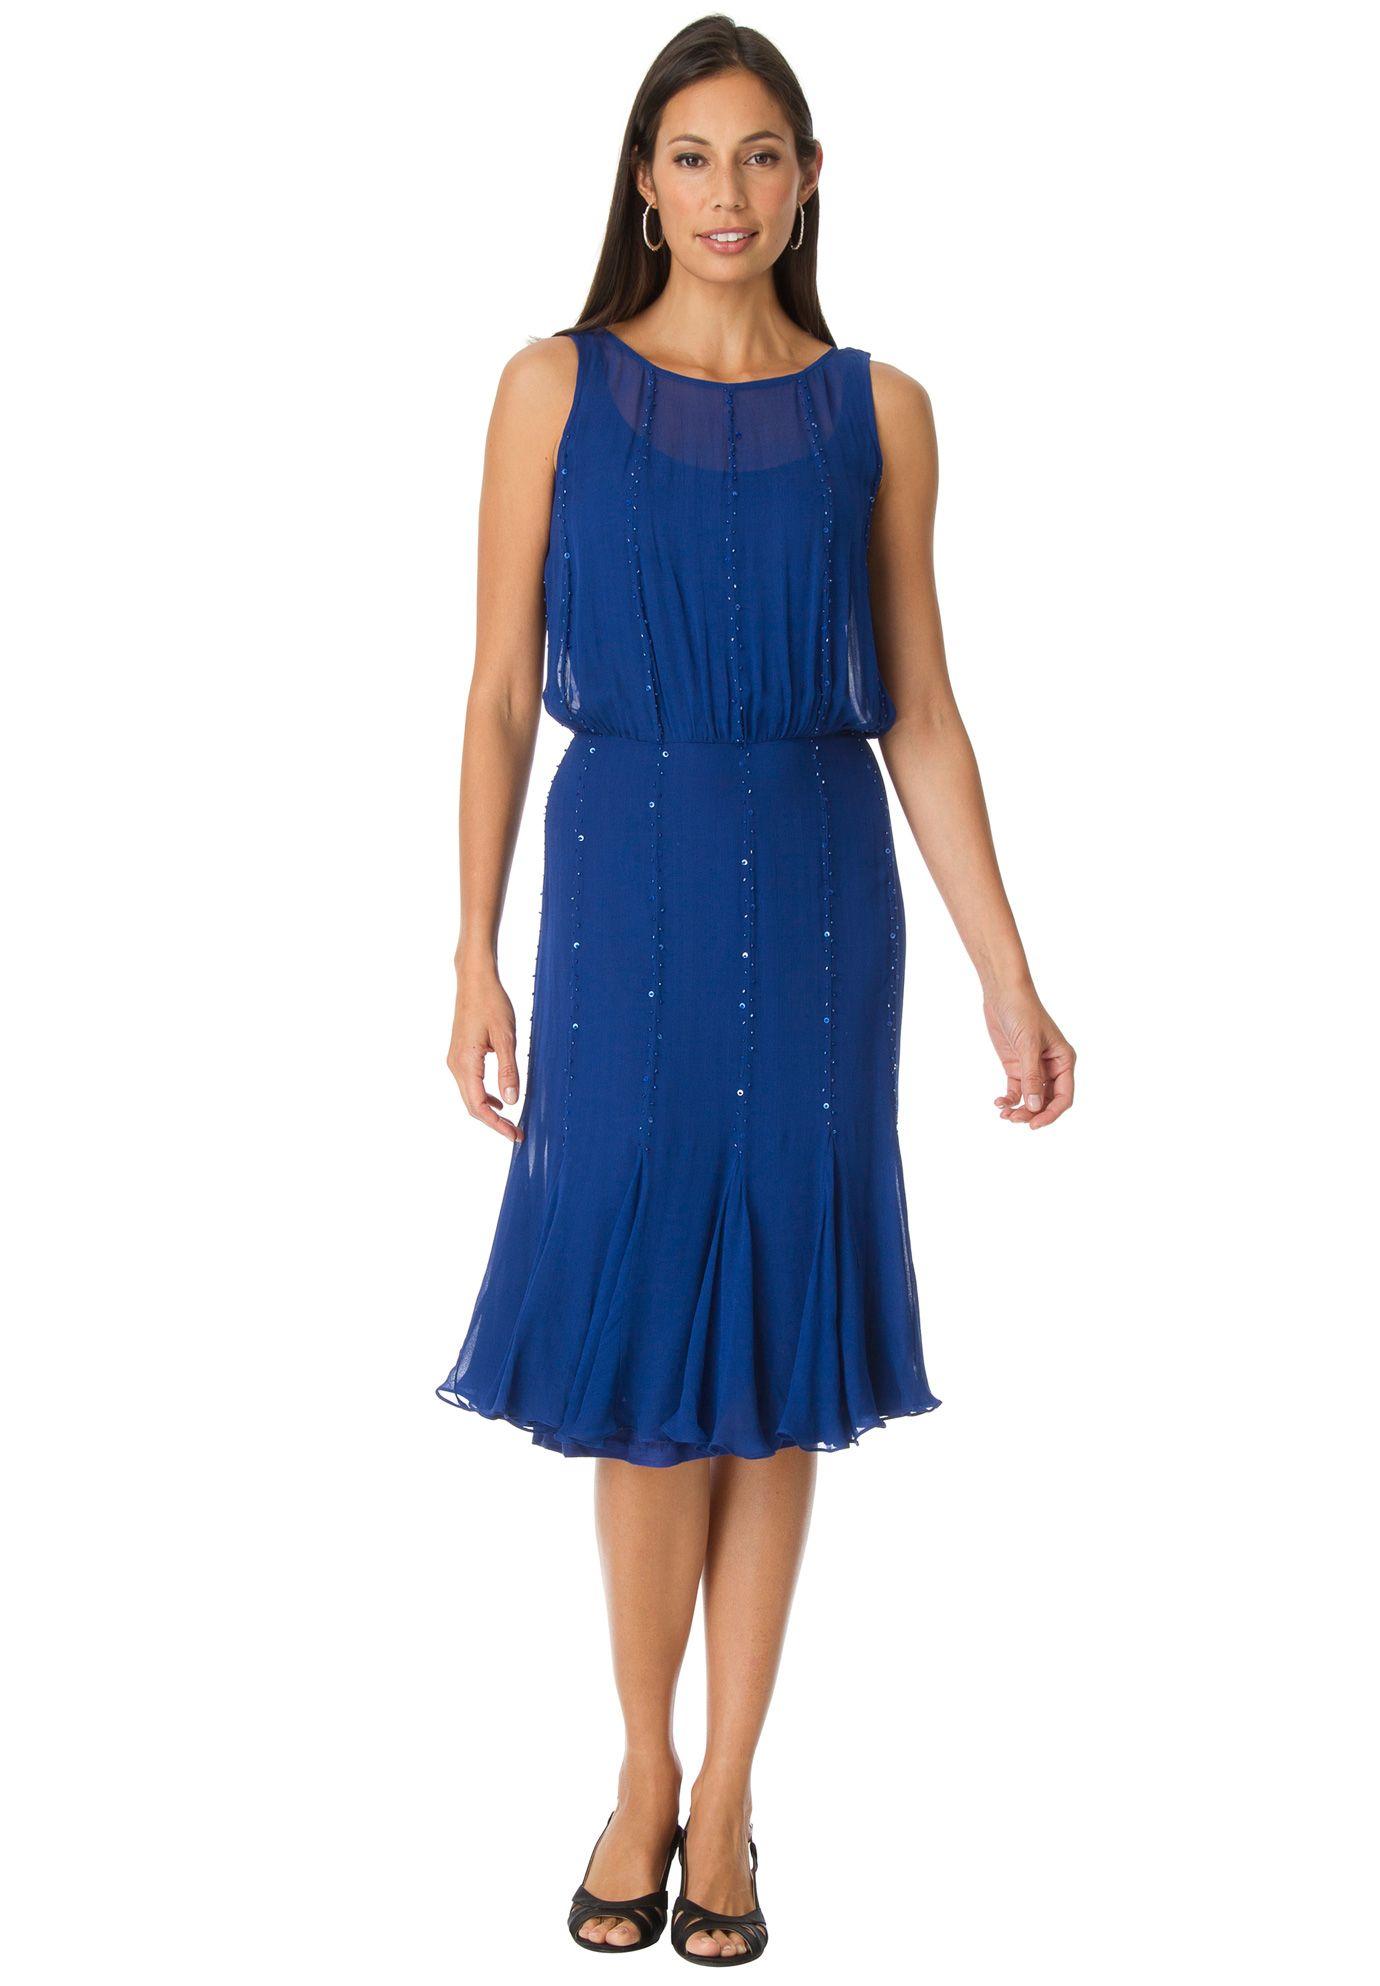 Beautifully beaded blouson dress with round neckline.